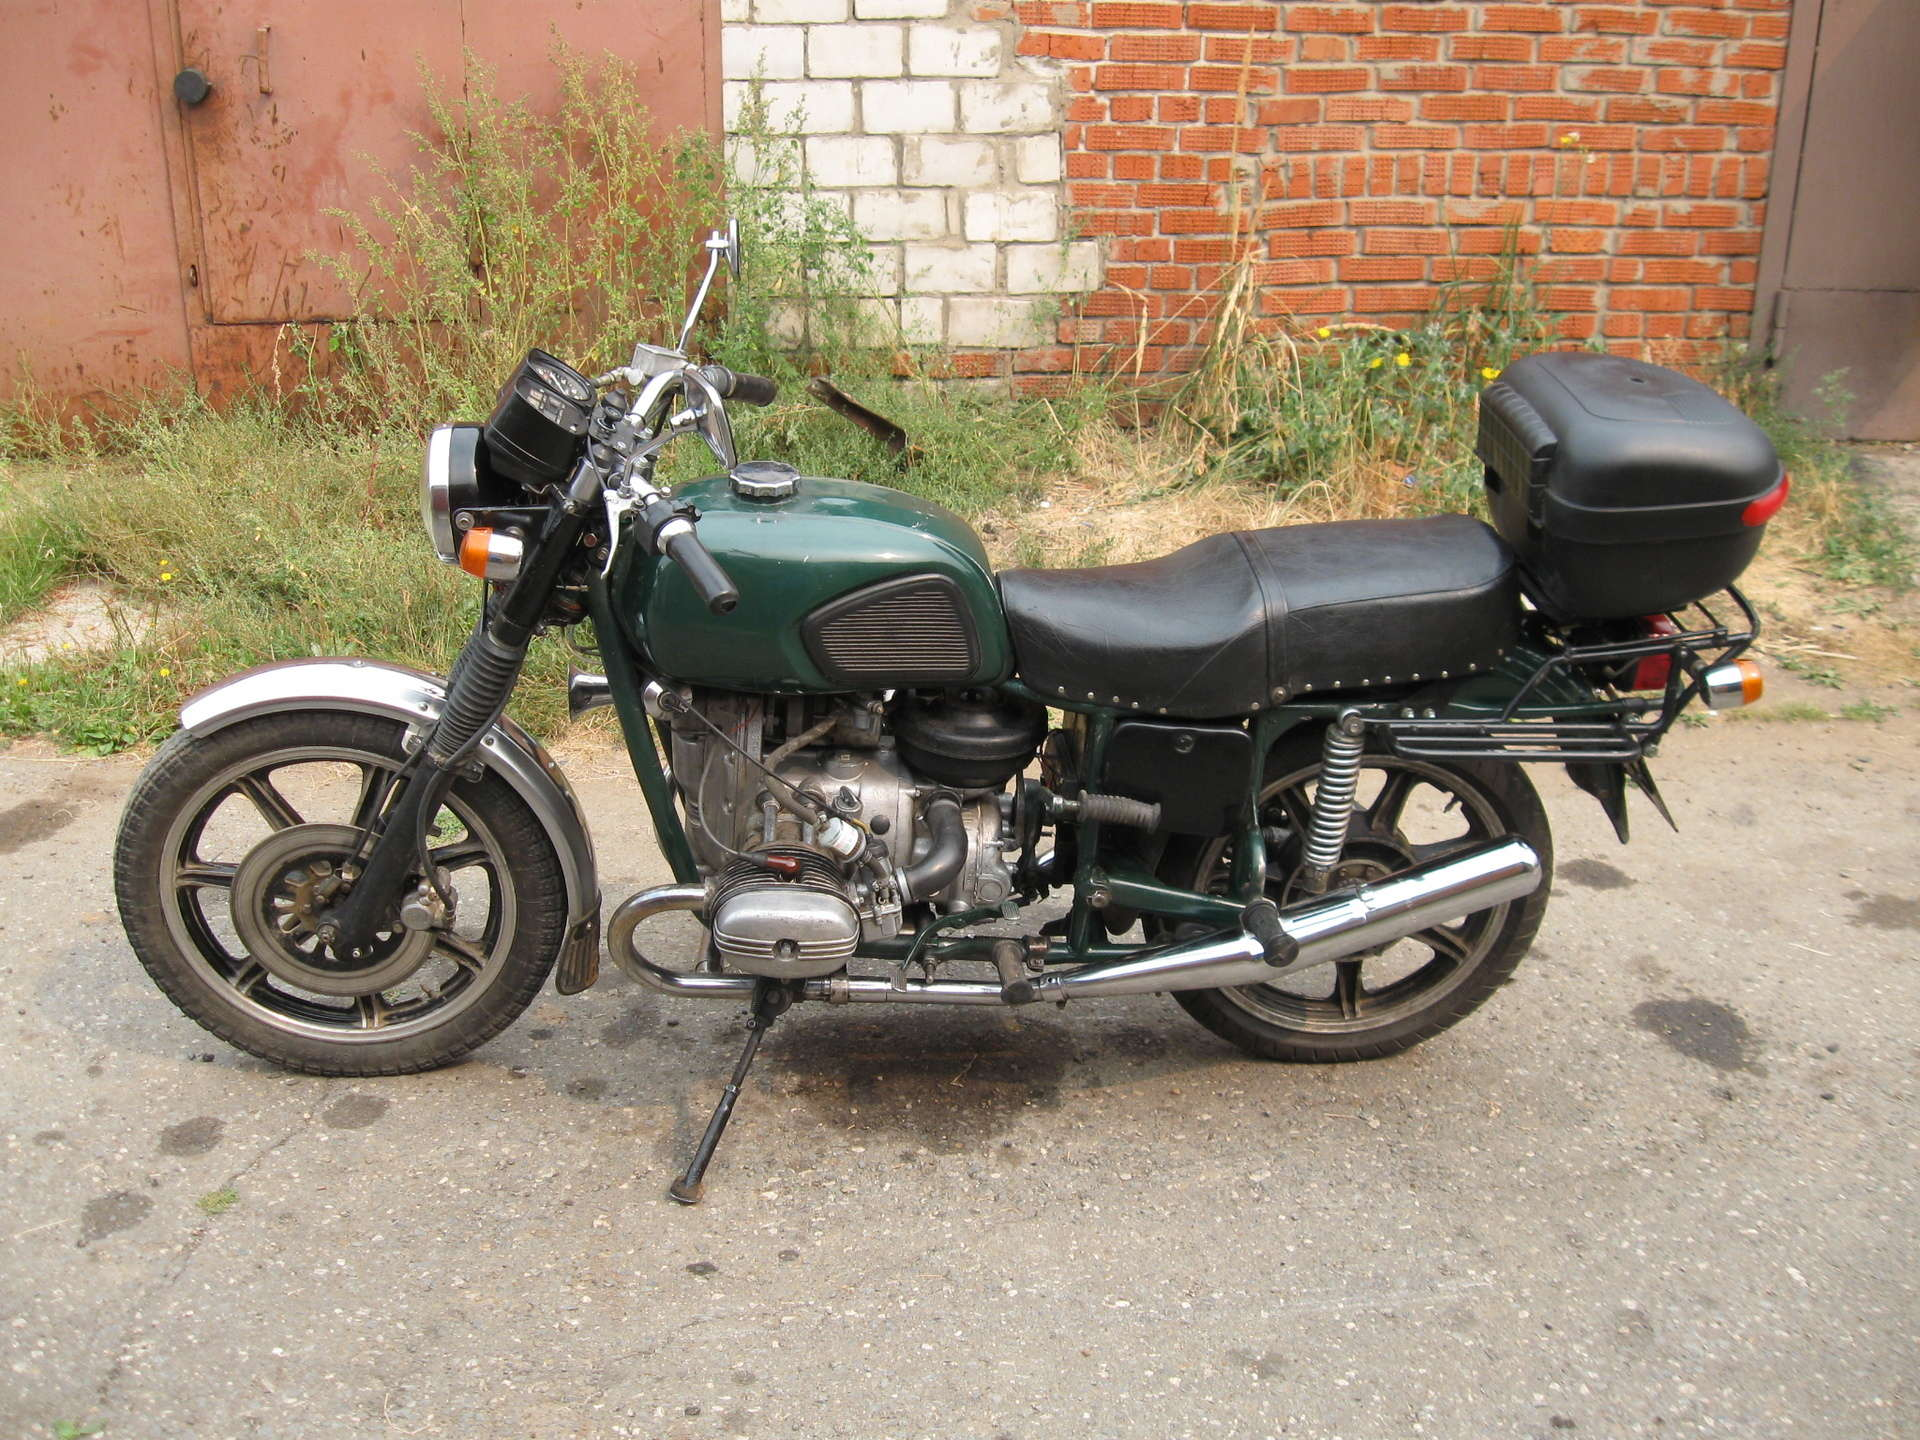 Мотоцикл Урал в оренбурге бу #11